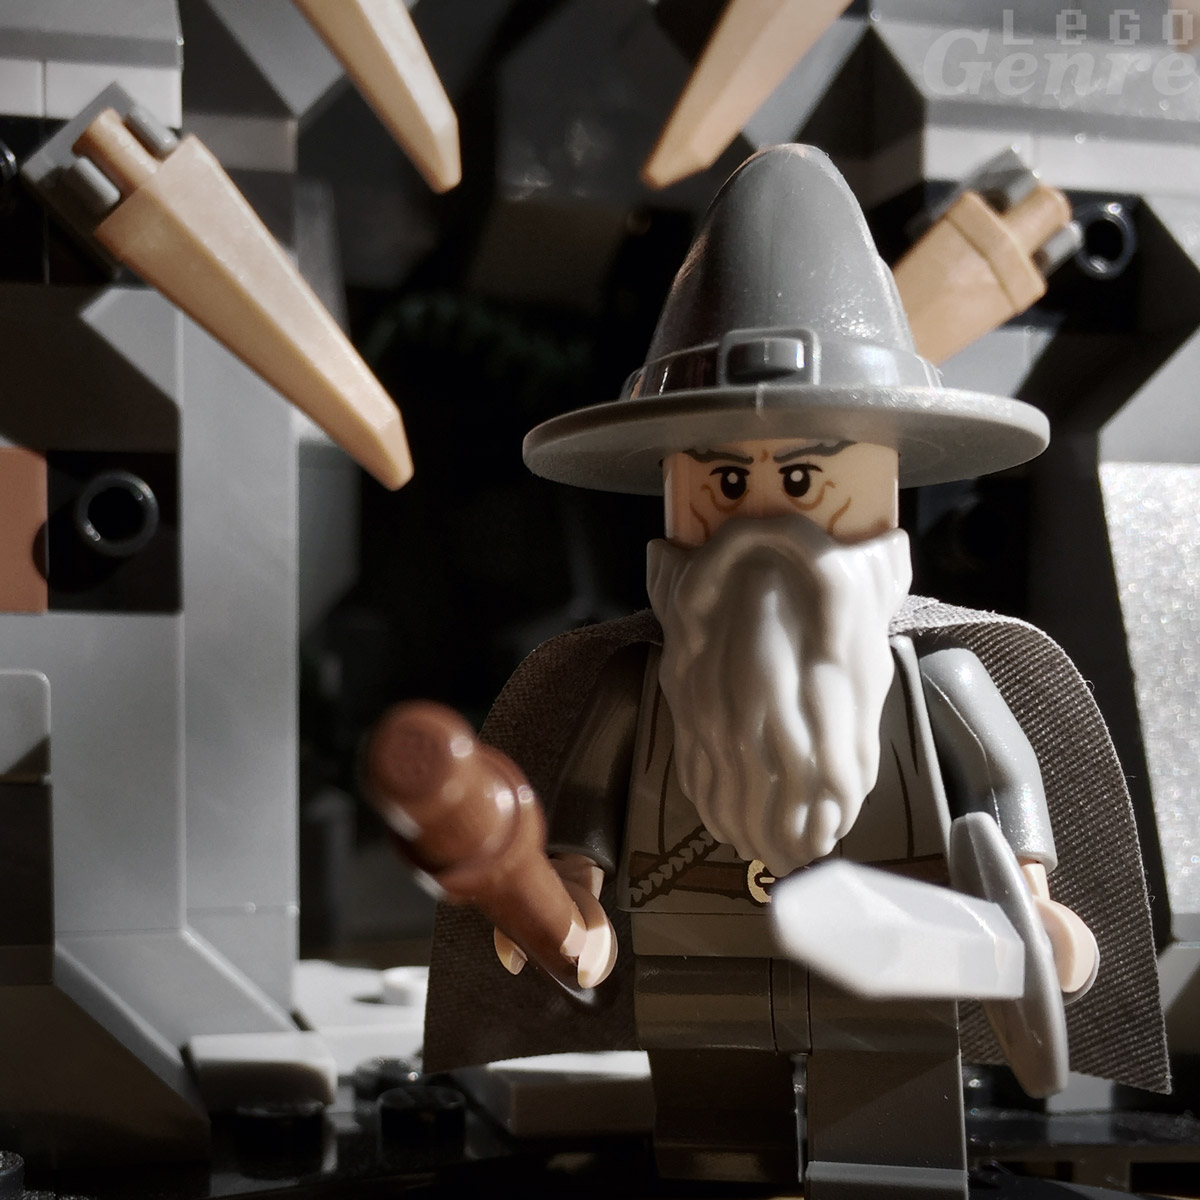 LegoGenre: Mithrandir